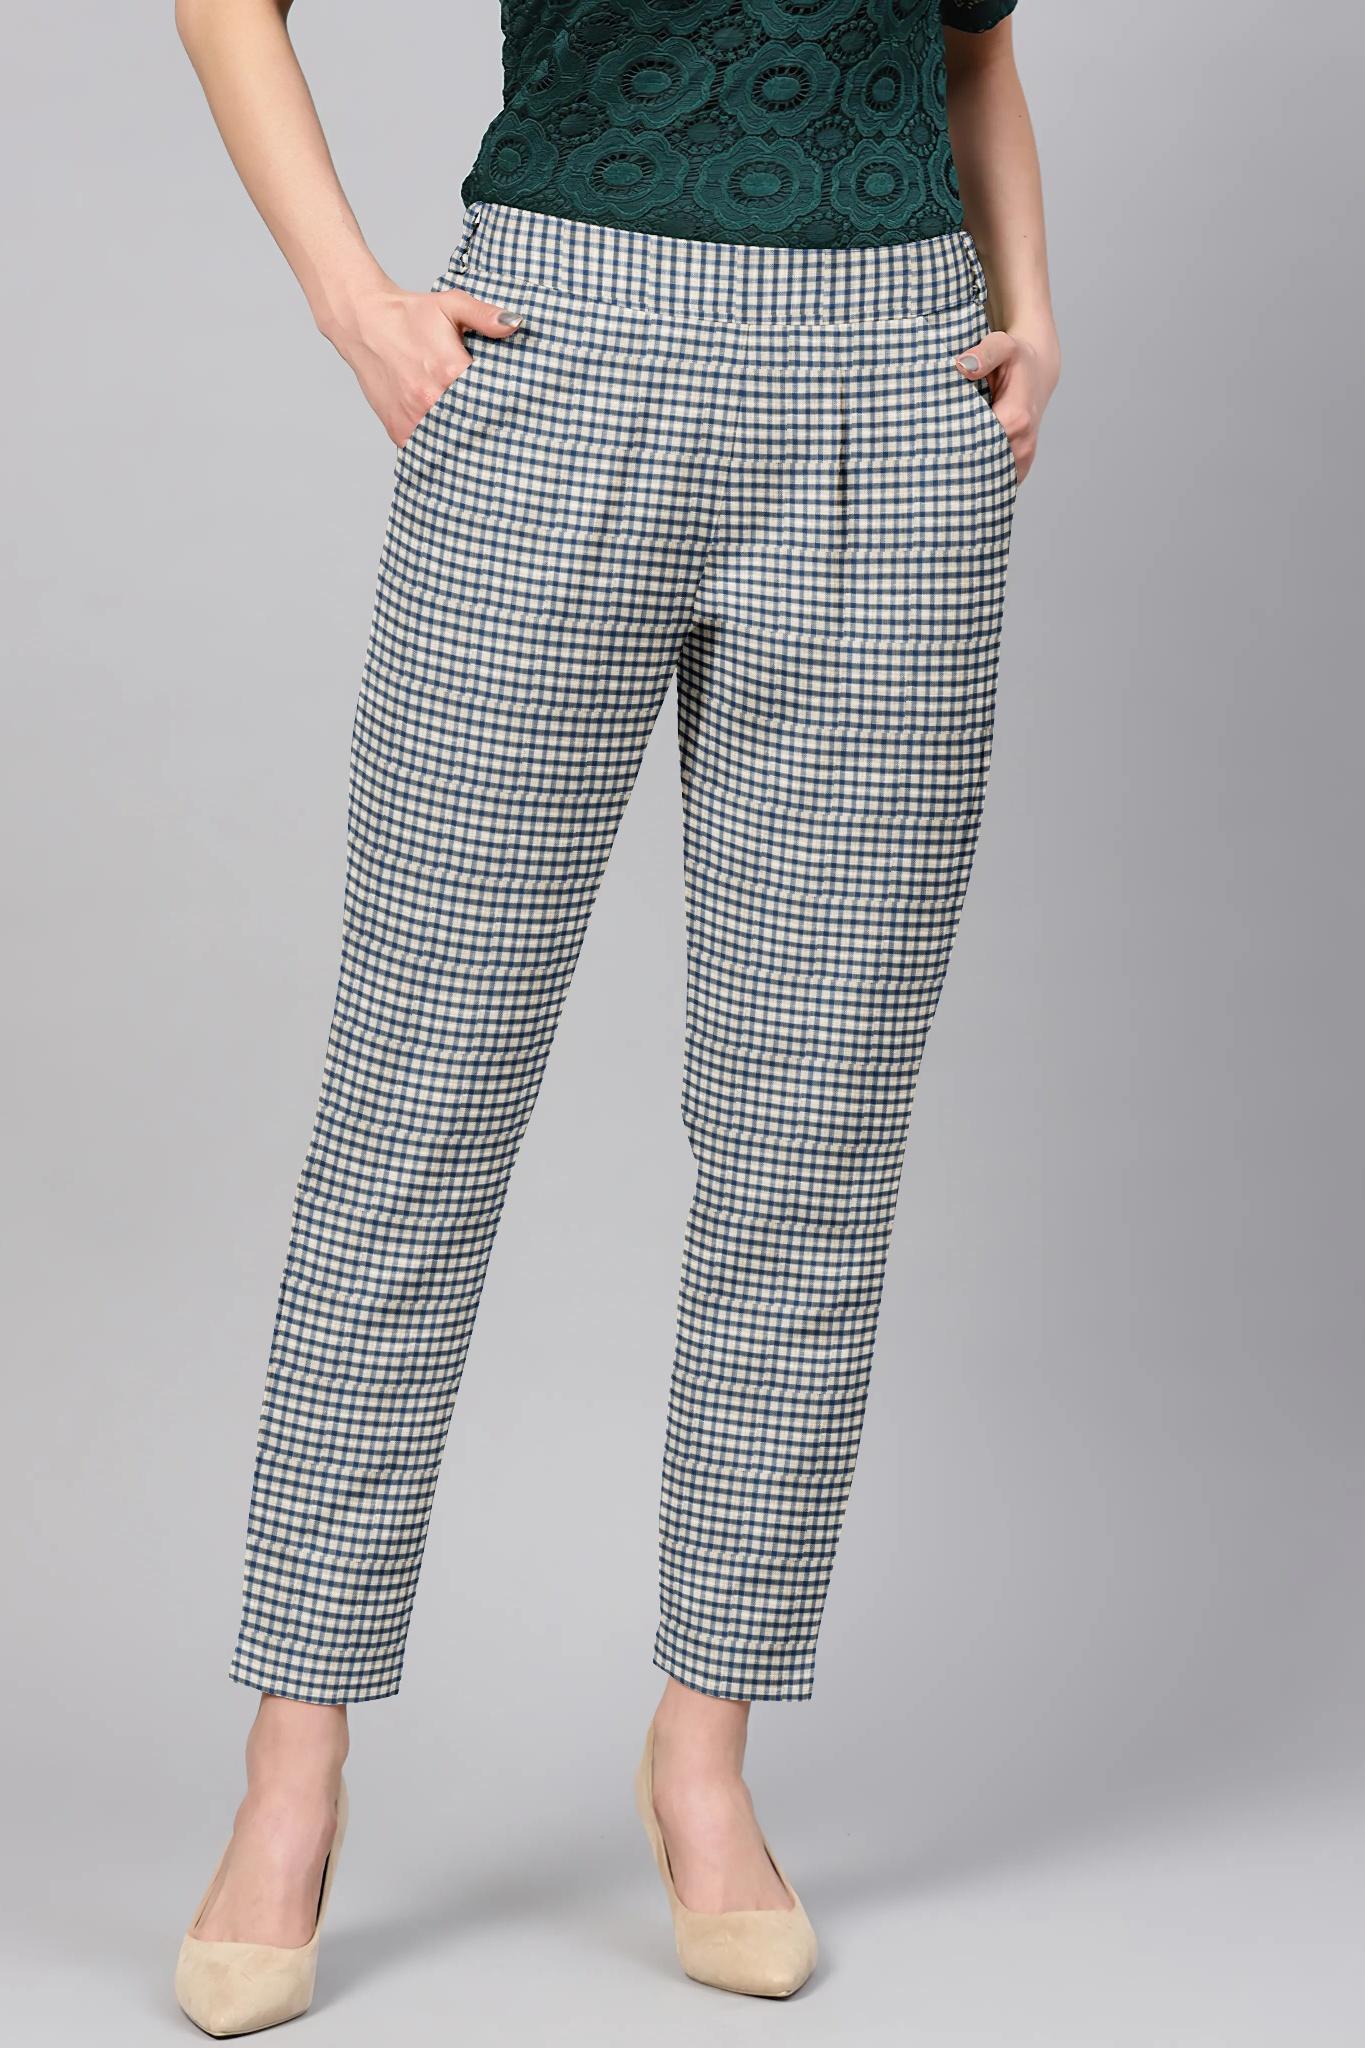 /home/customer/www/fabartcraft.com/public_html/uploadshttps://www.shopolics.com/uploads/images/medium/White-Black-Cotton-Check-Regular-Fit-Solid-Trouser-36074.jpg